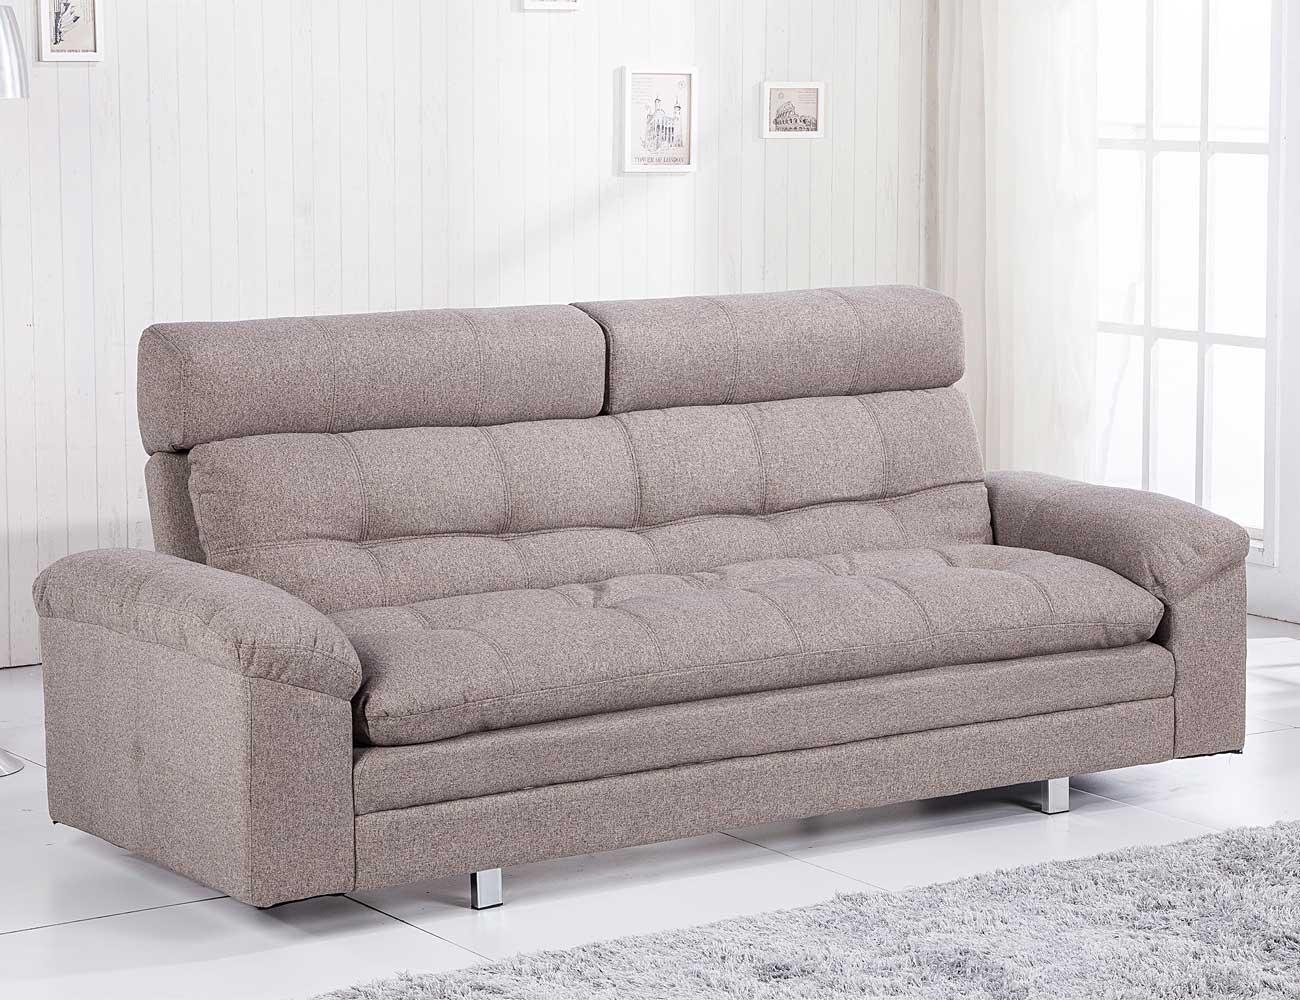 Sofa cama chaiselongue elegance moka 2